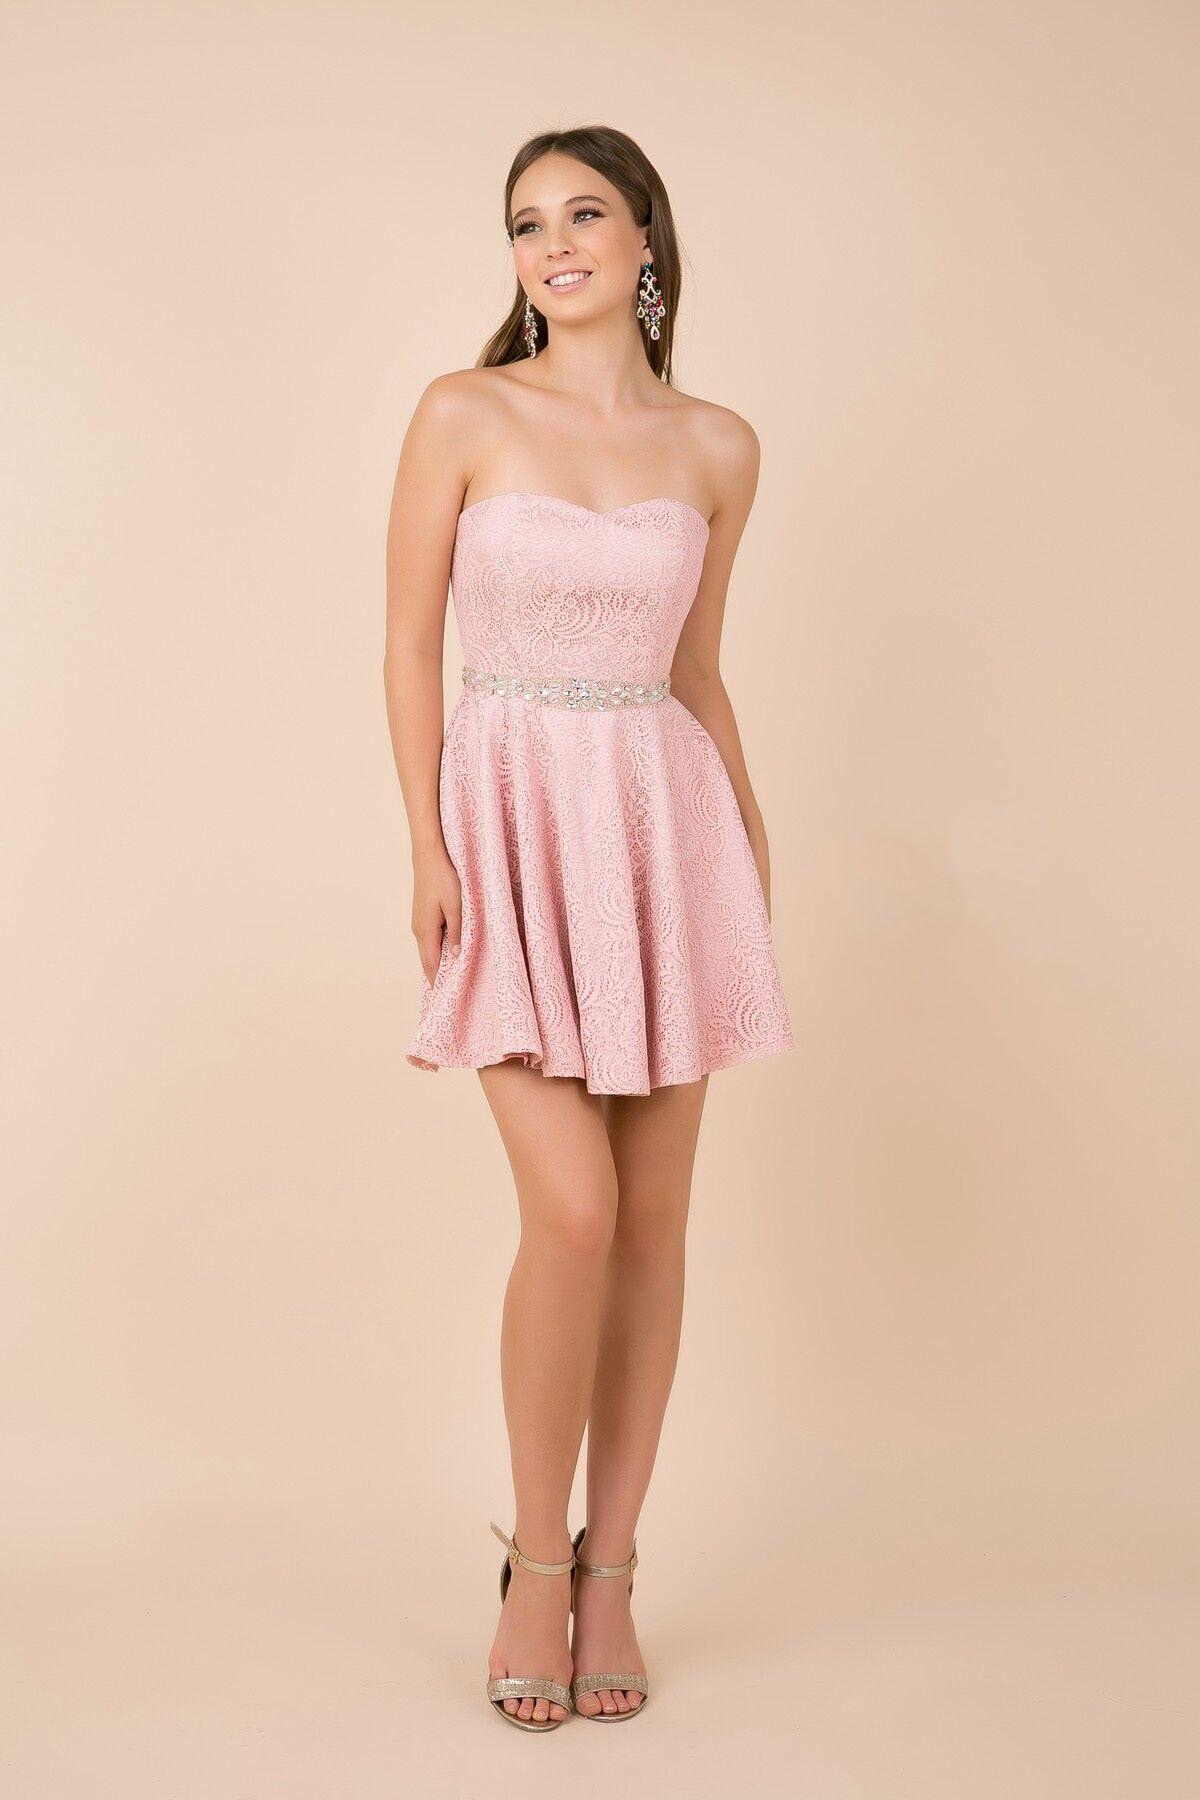 Nox Anabel 6358 Embellished Waist Sweetheart Neckline Cocktail Dress Pink Dress Short Bridesmaid Dresses Plus Size Plus Size Wedding Guest Dresses [ 1800 x 1200 Pixel ]